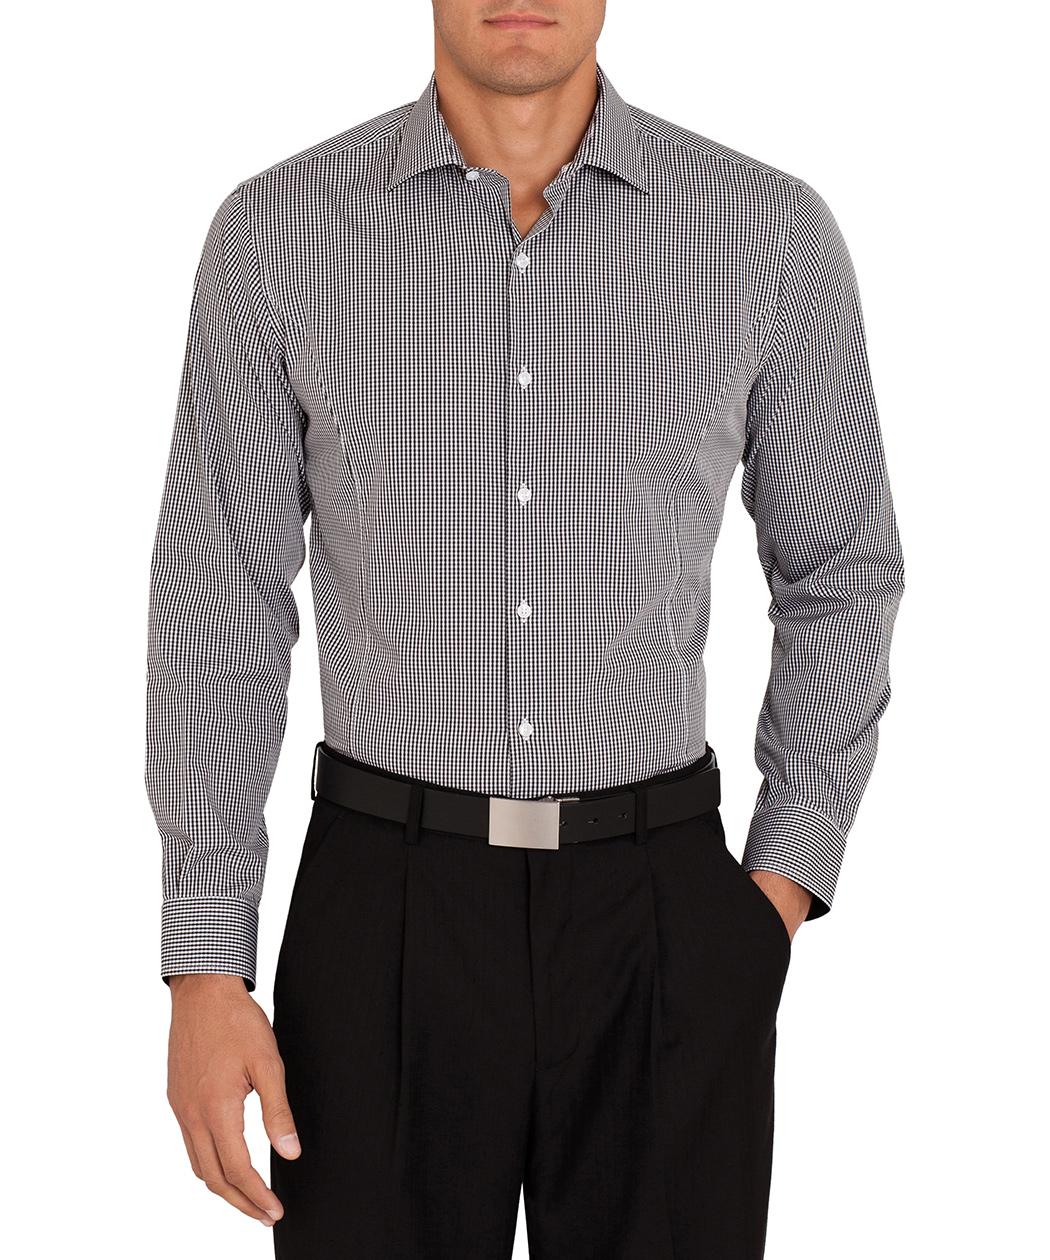 395207233f ... Van Heusen Studio Cotton Black Gingham Check Shirt. Product Image ·  Image 1 ...